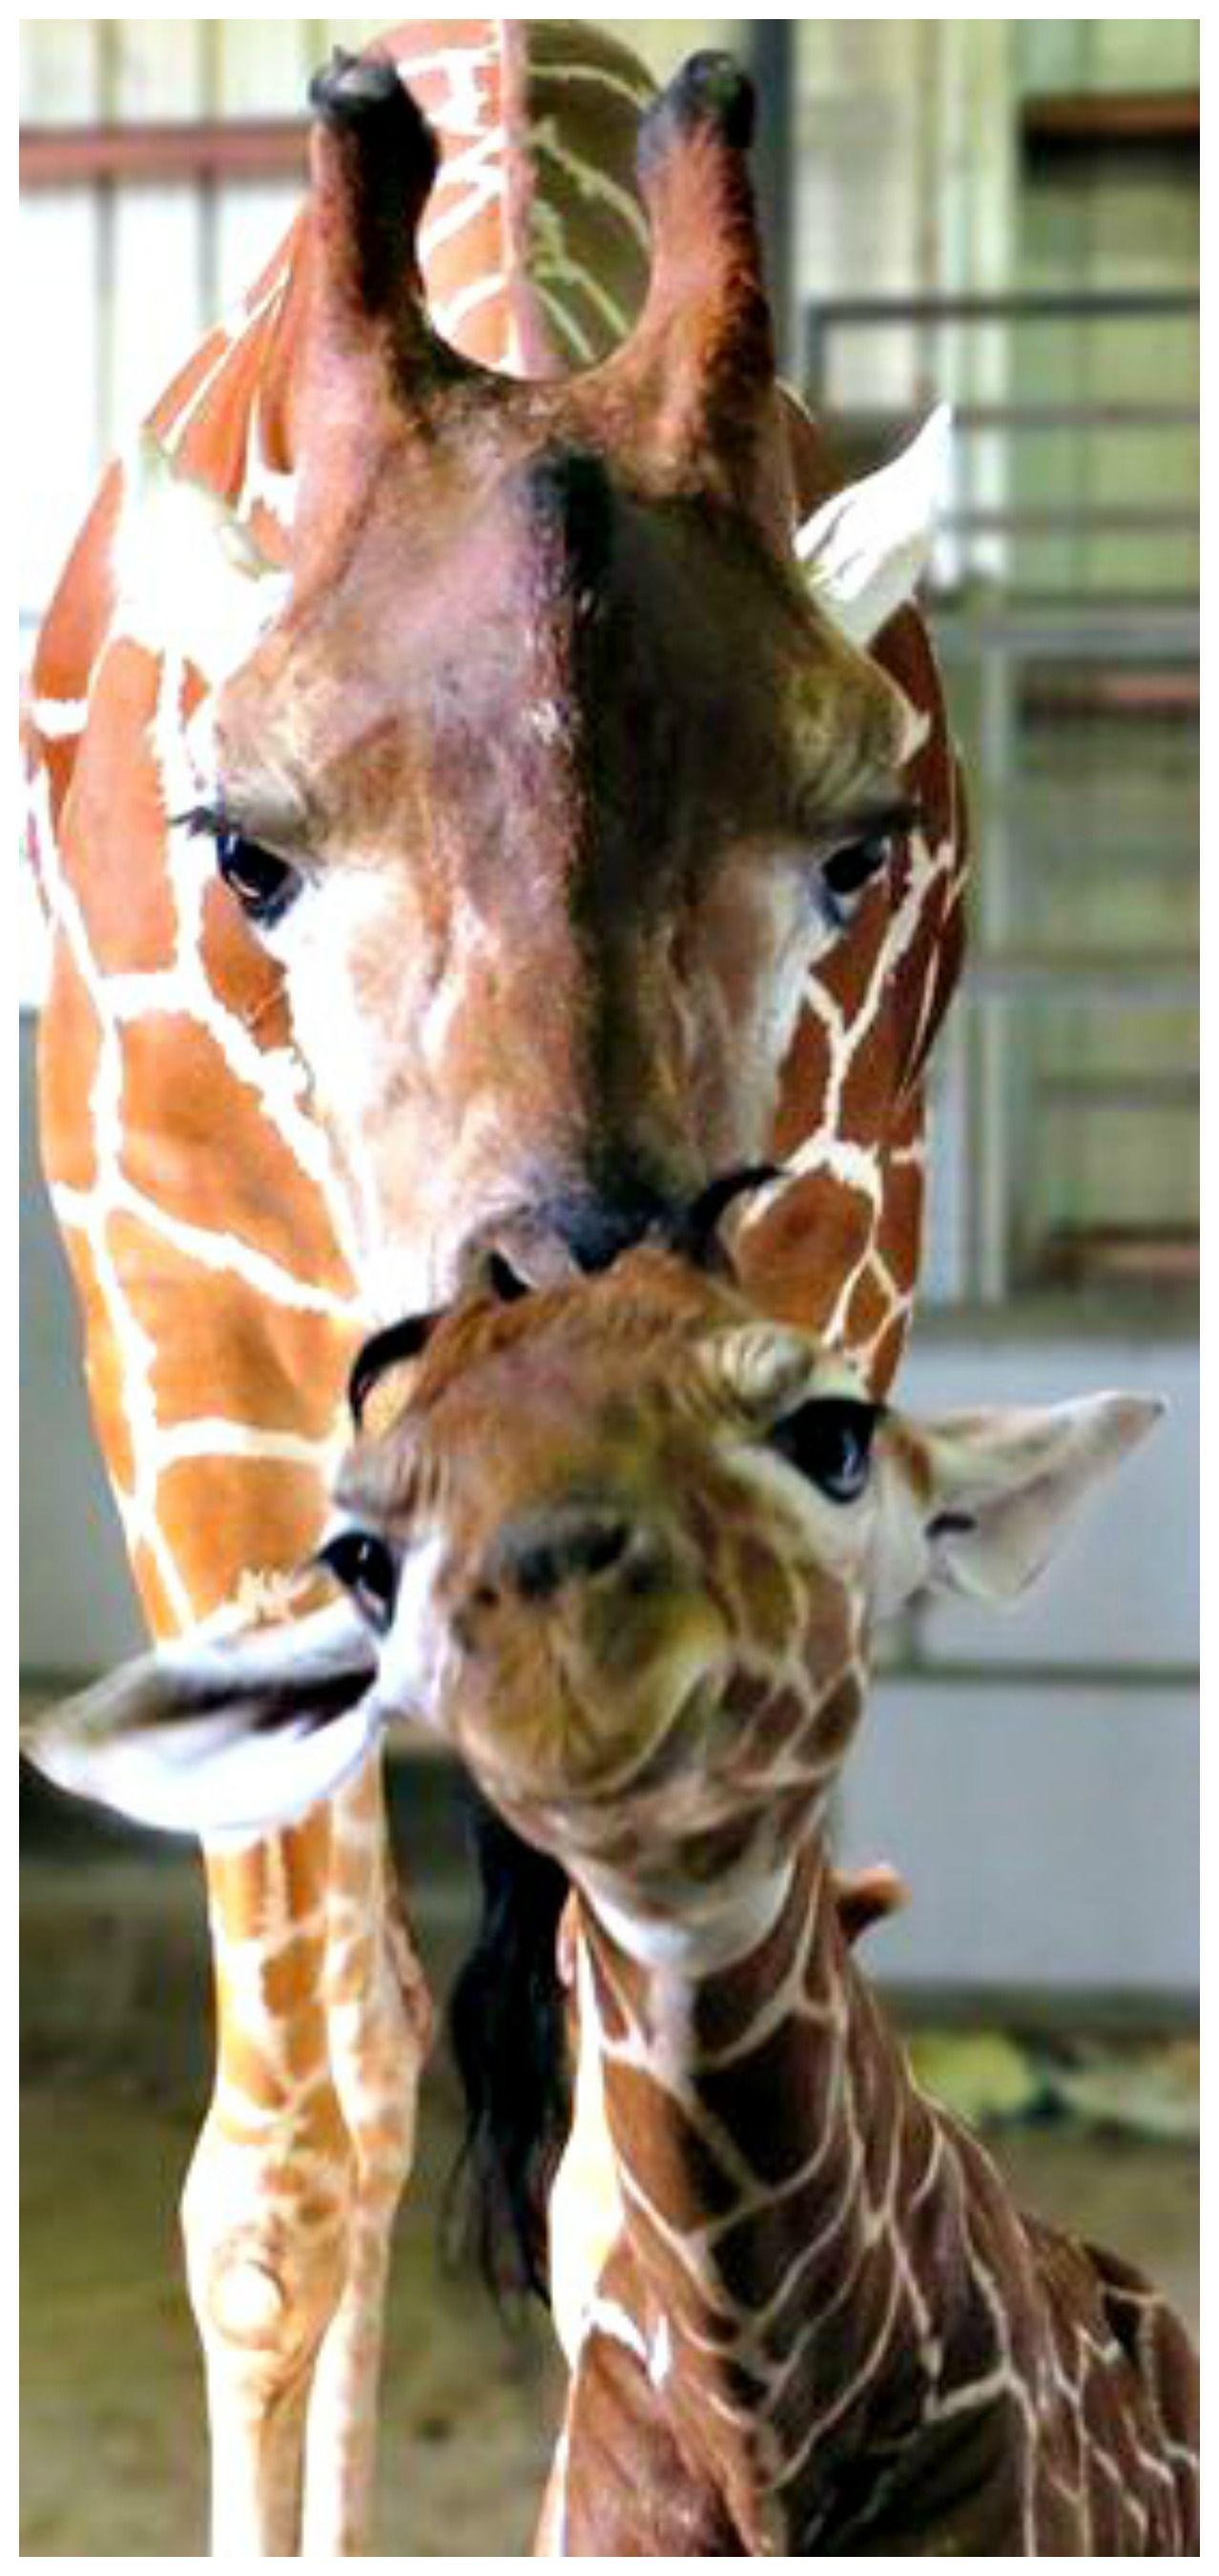 Jacksonville Zoo and Gardens baby giraffe Cute